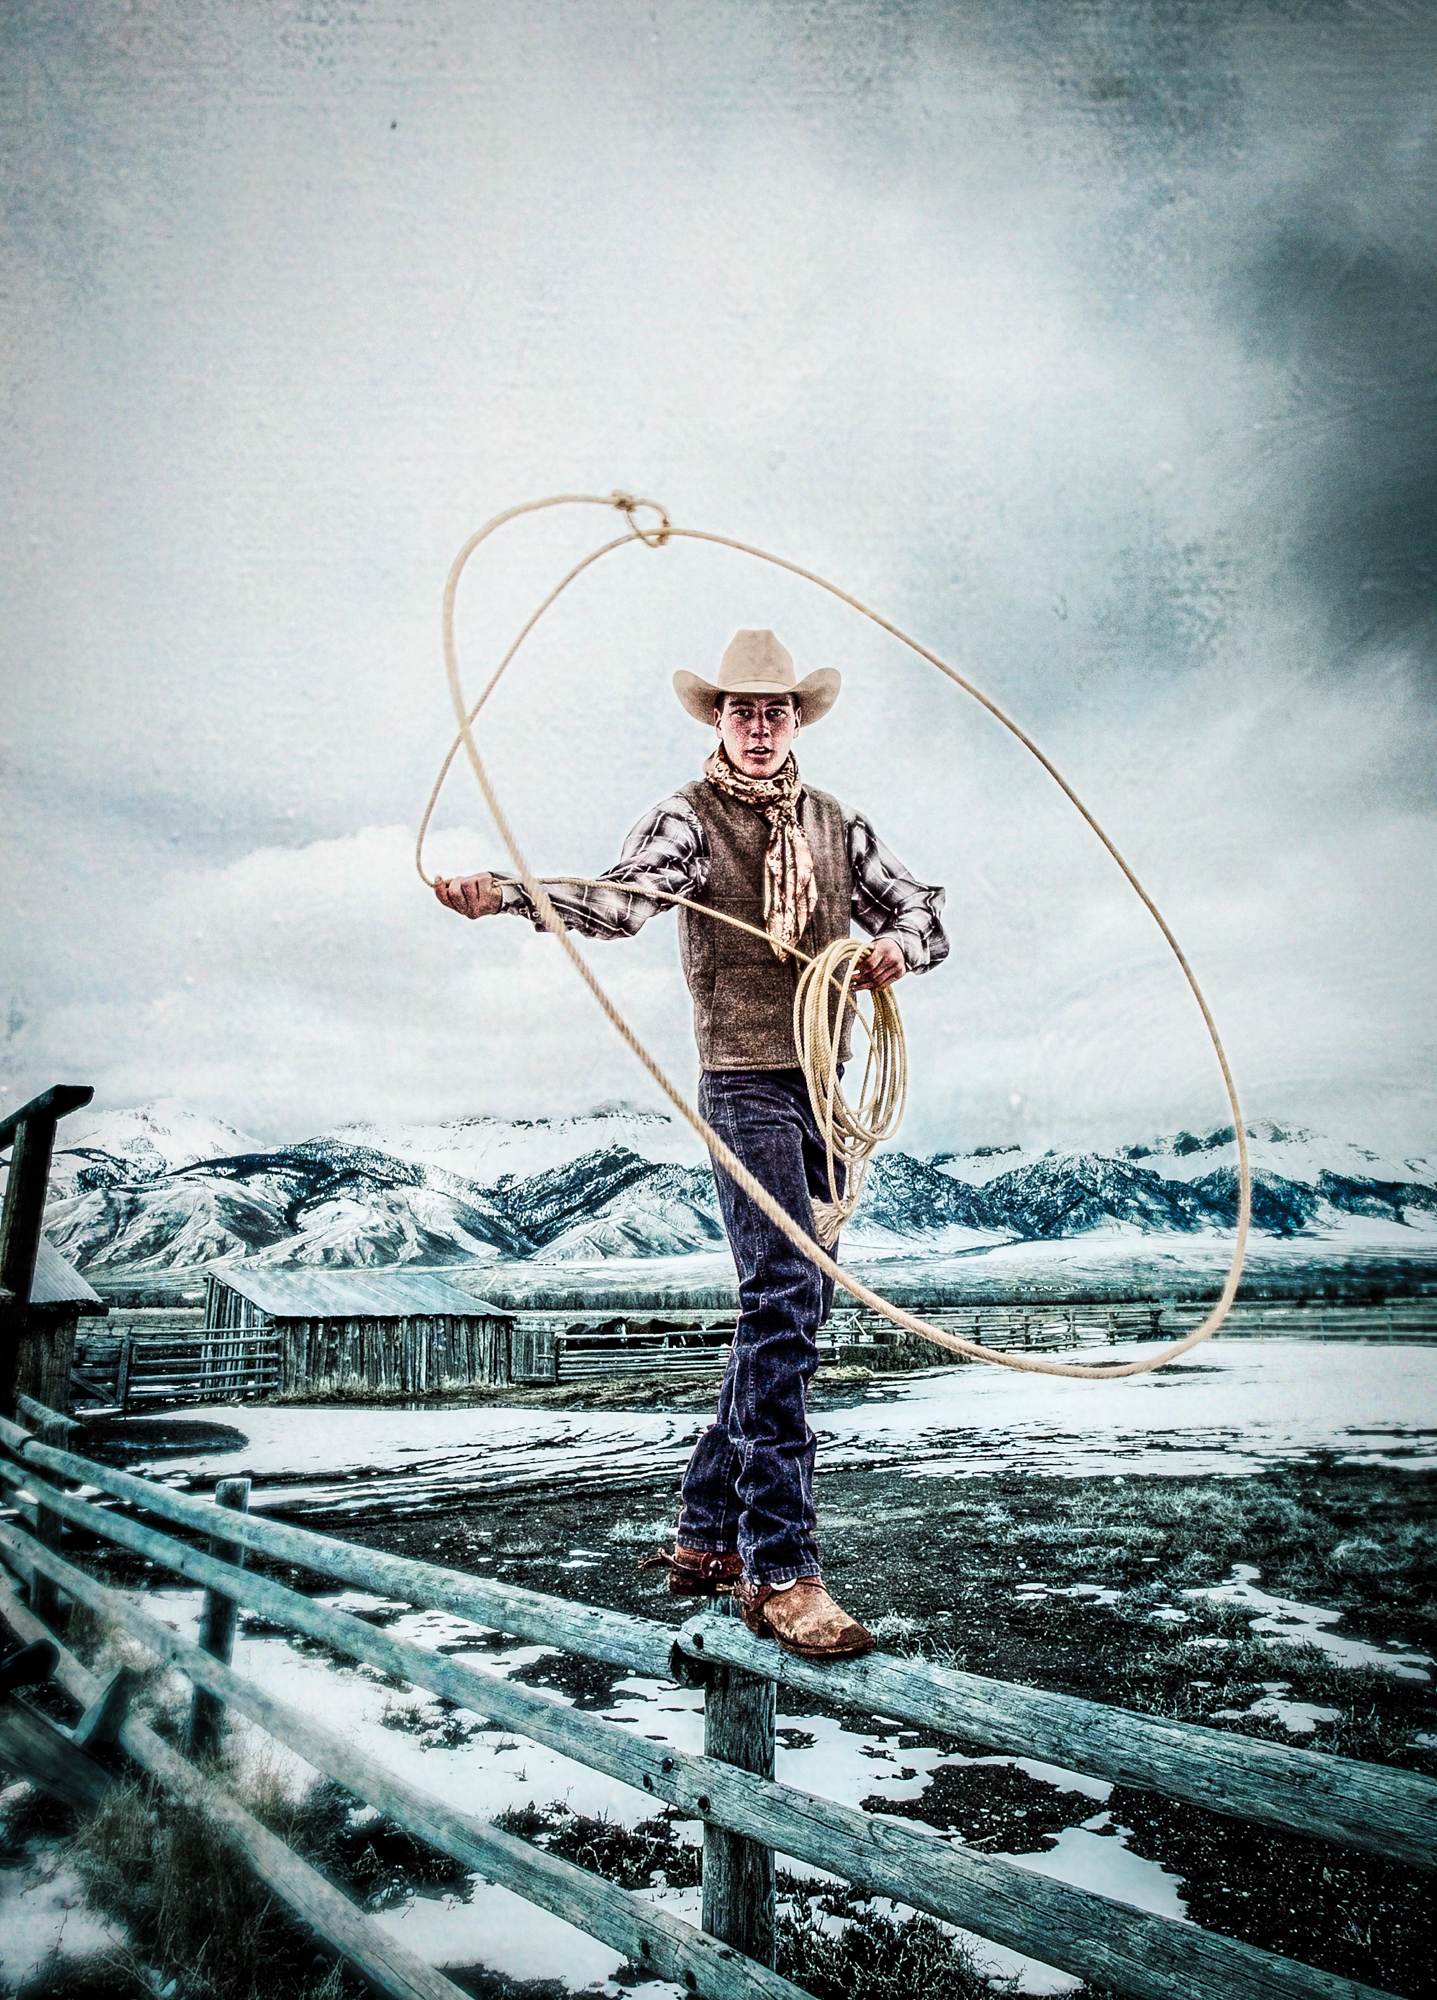 rick-meoli-commercial-photographer-outdoor-animal-lifestyle-repheads-77